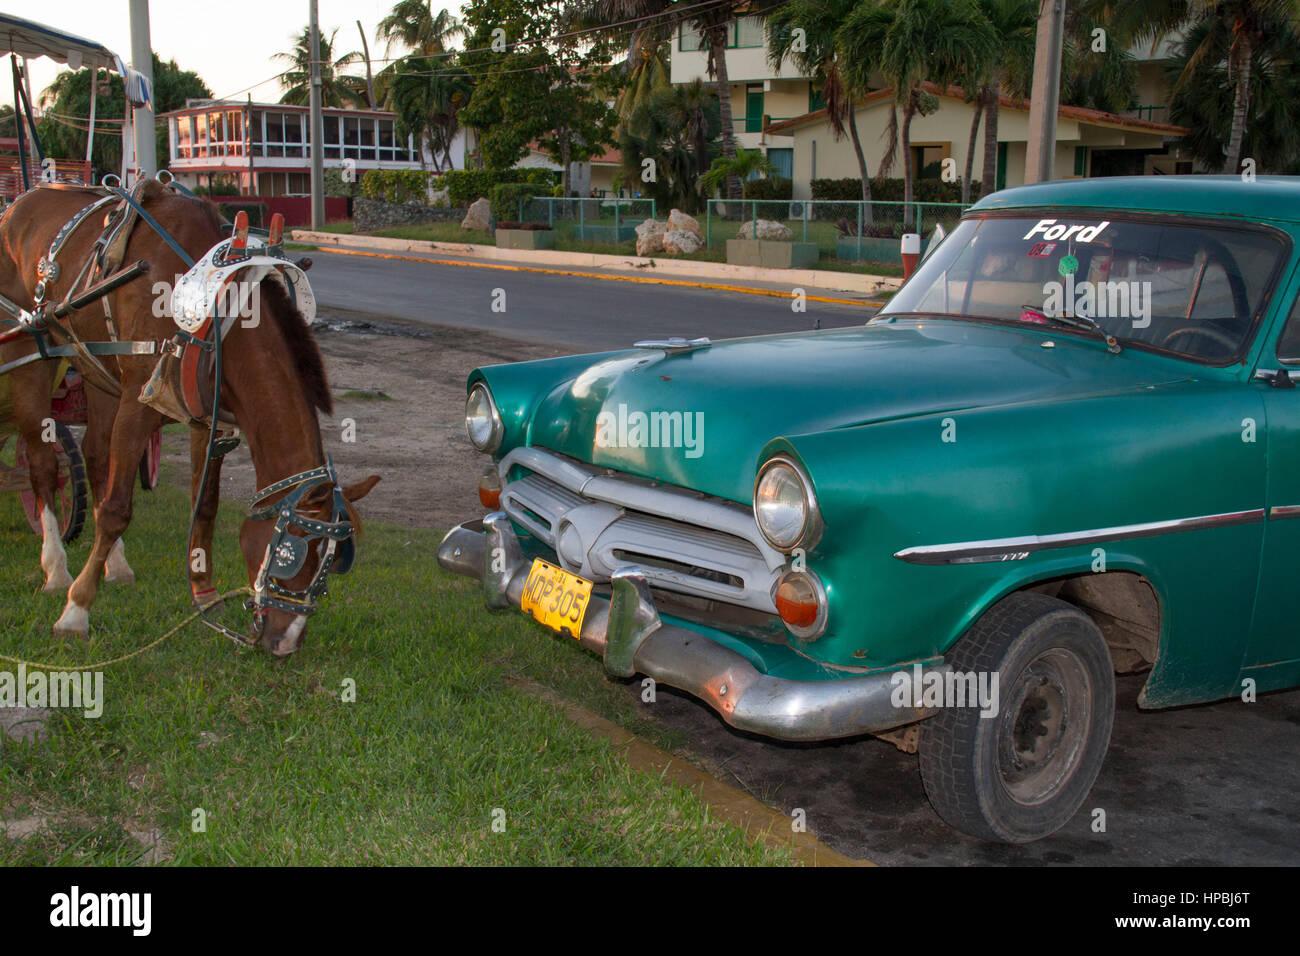 Ford Oldtimer, Pferd, Varadero, Kuba, Kuba Stockbild